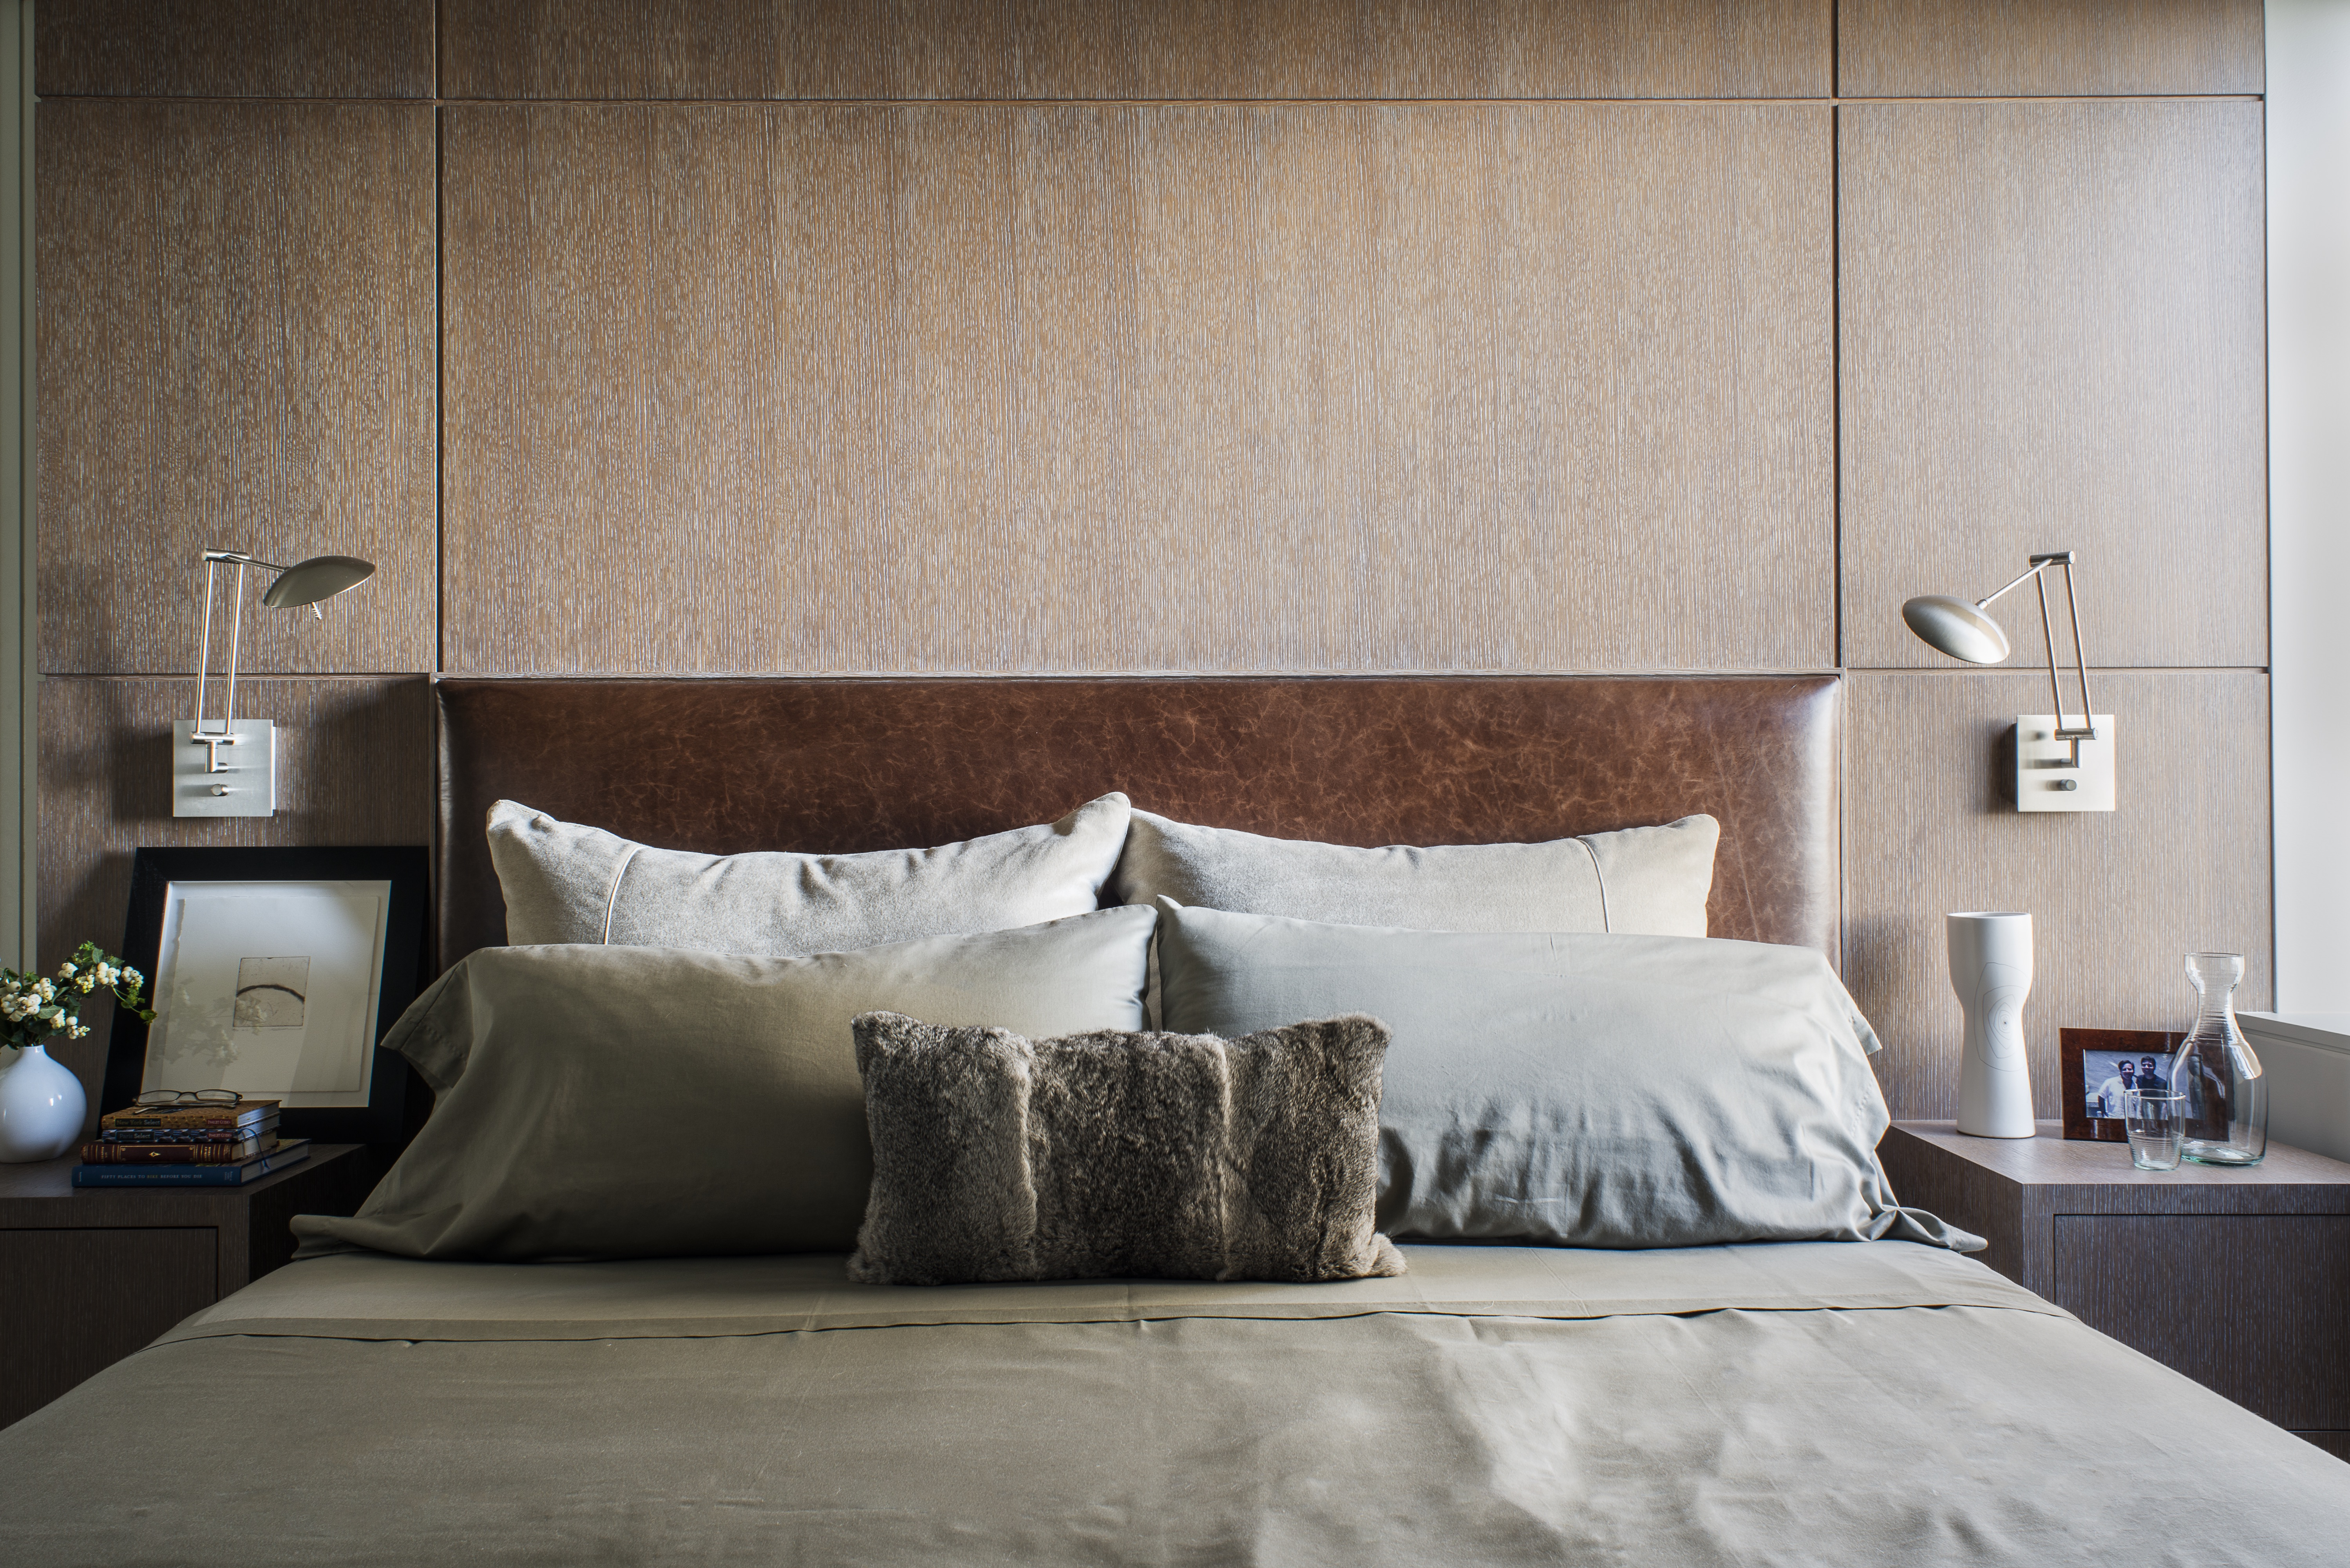 kw_chestnut-bedroom.jpg